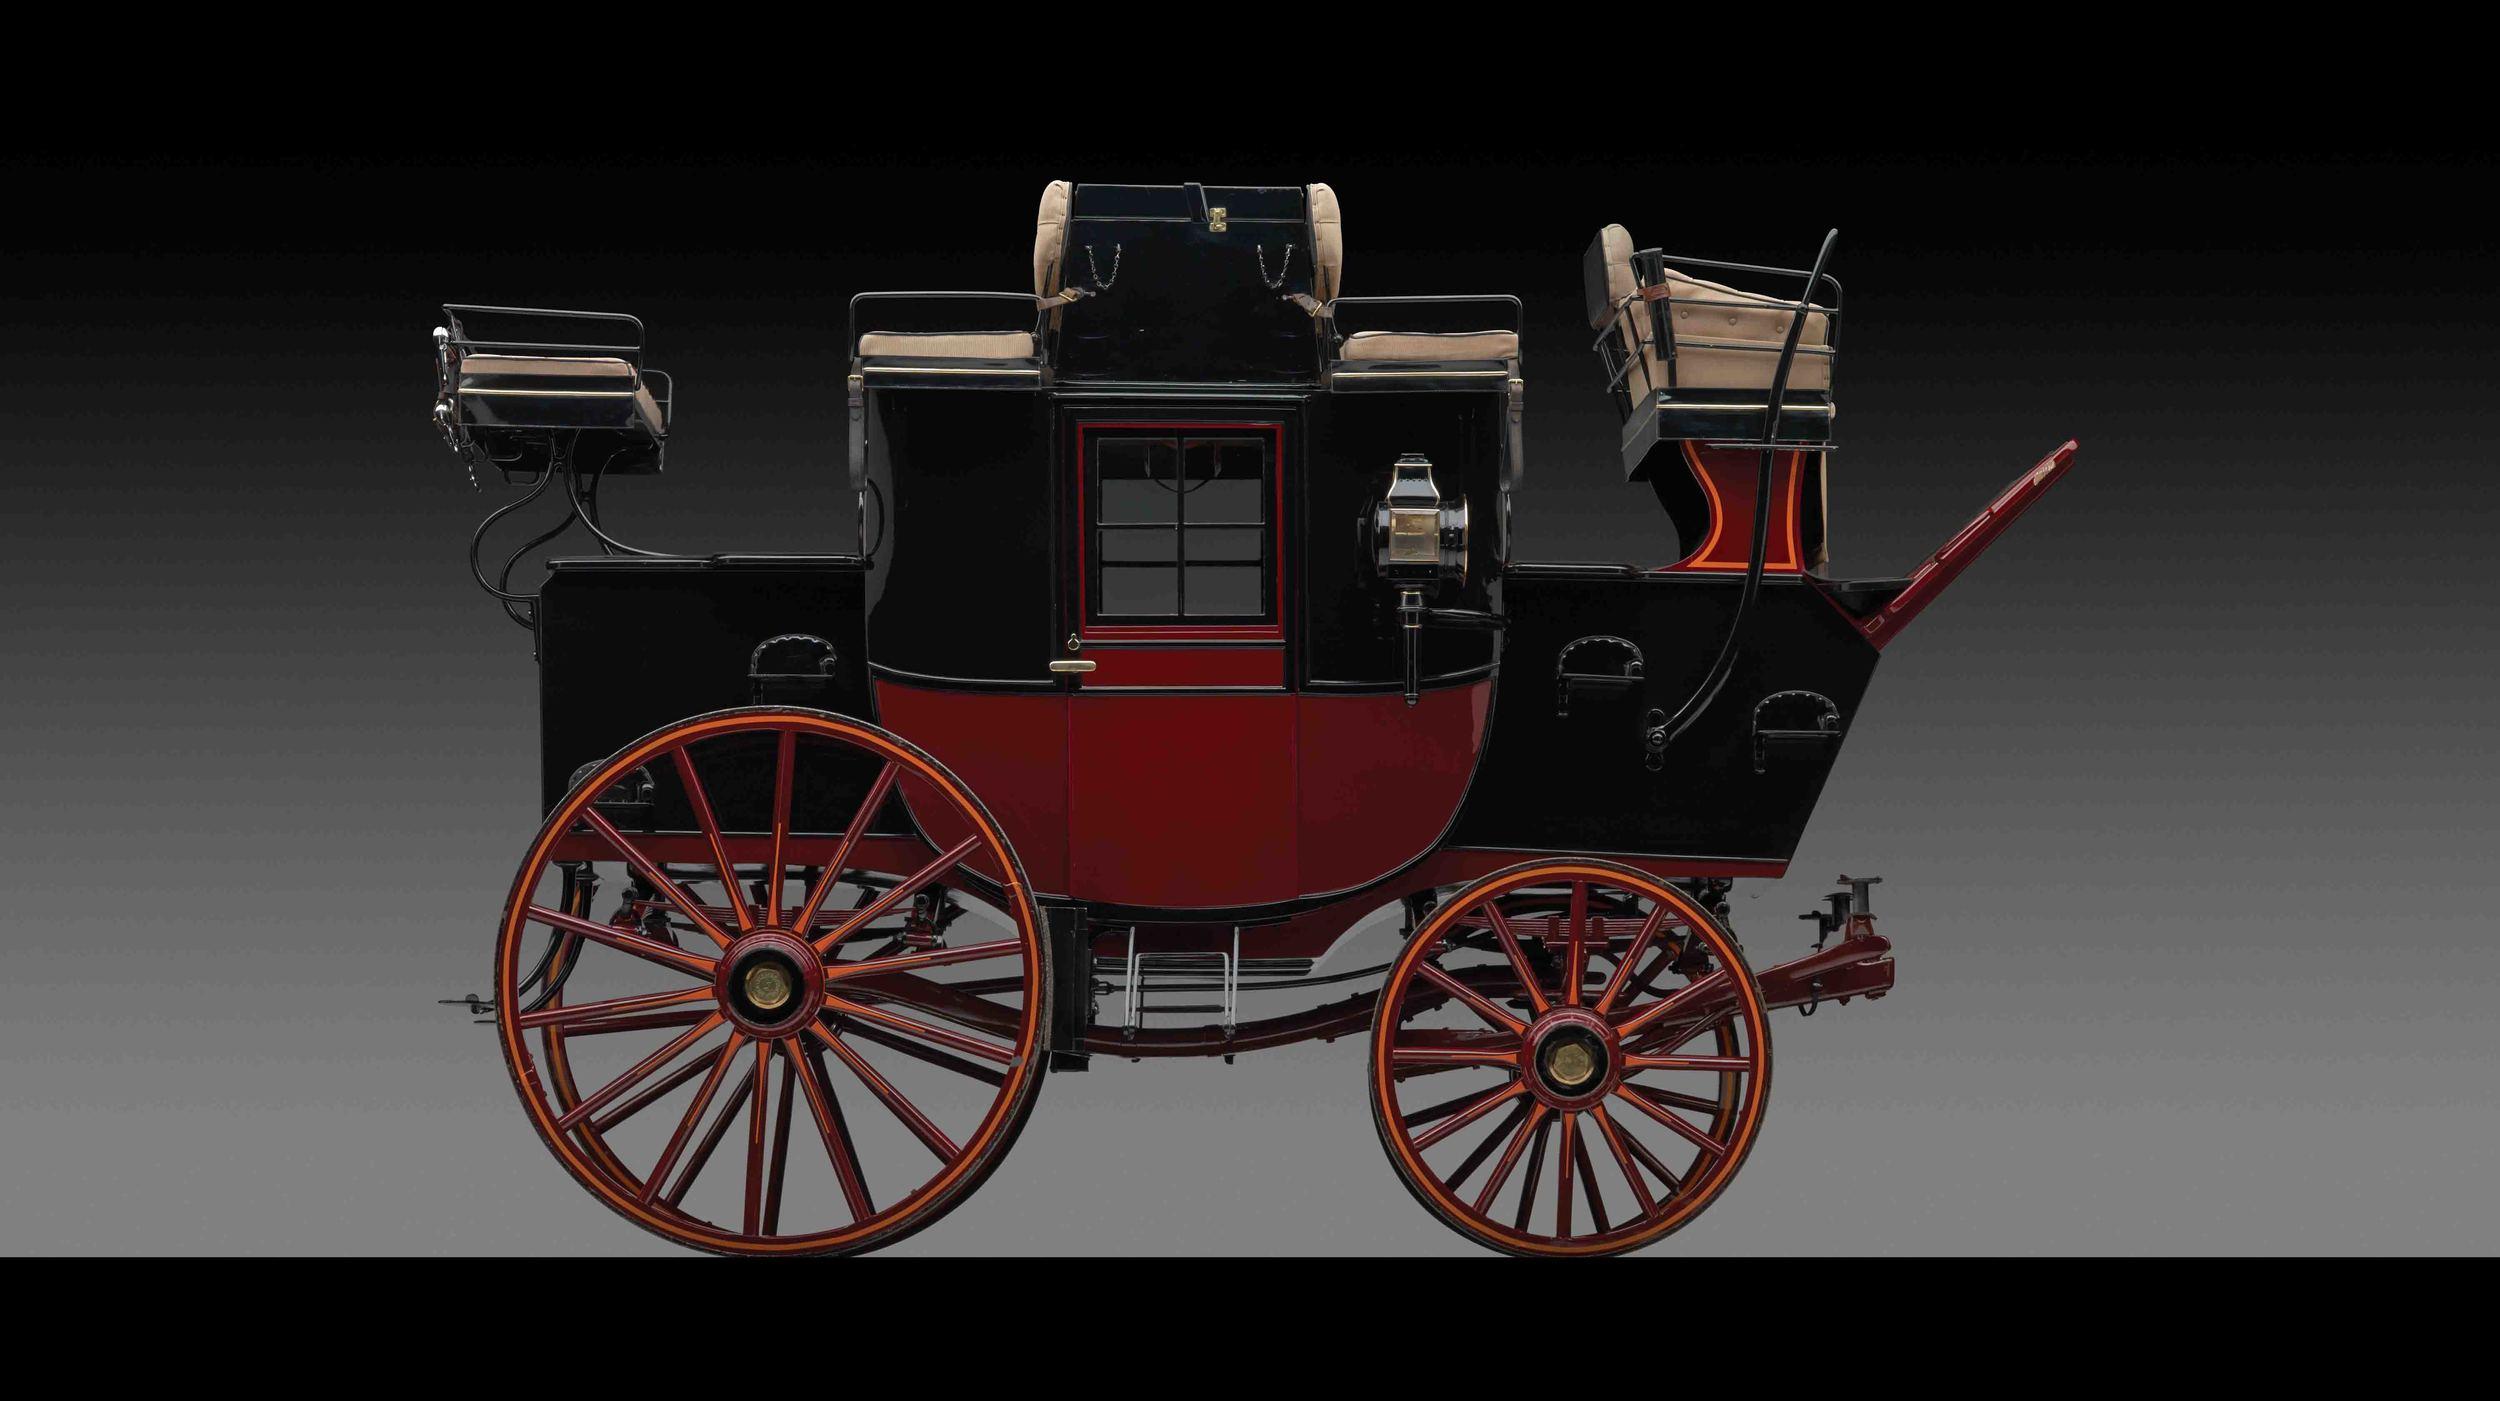 "NY13_r123_001 img alt=""brewster park drag the art of the automobile the car crush"".jpg"